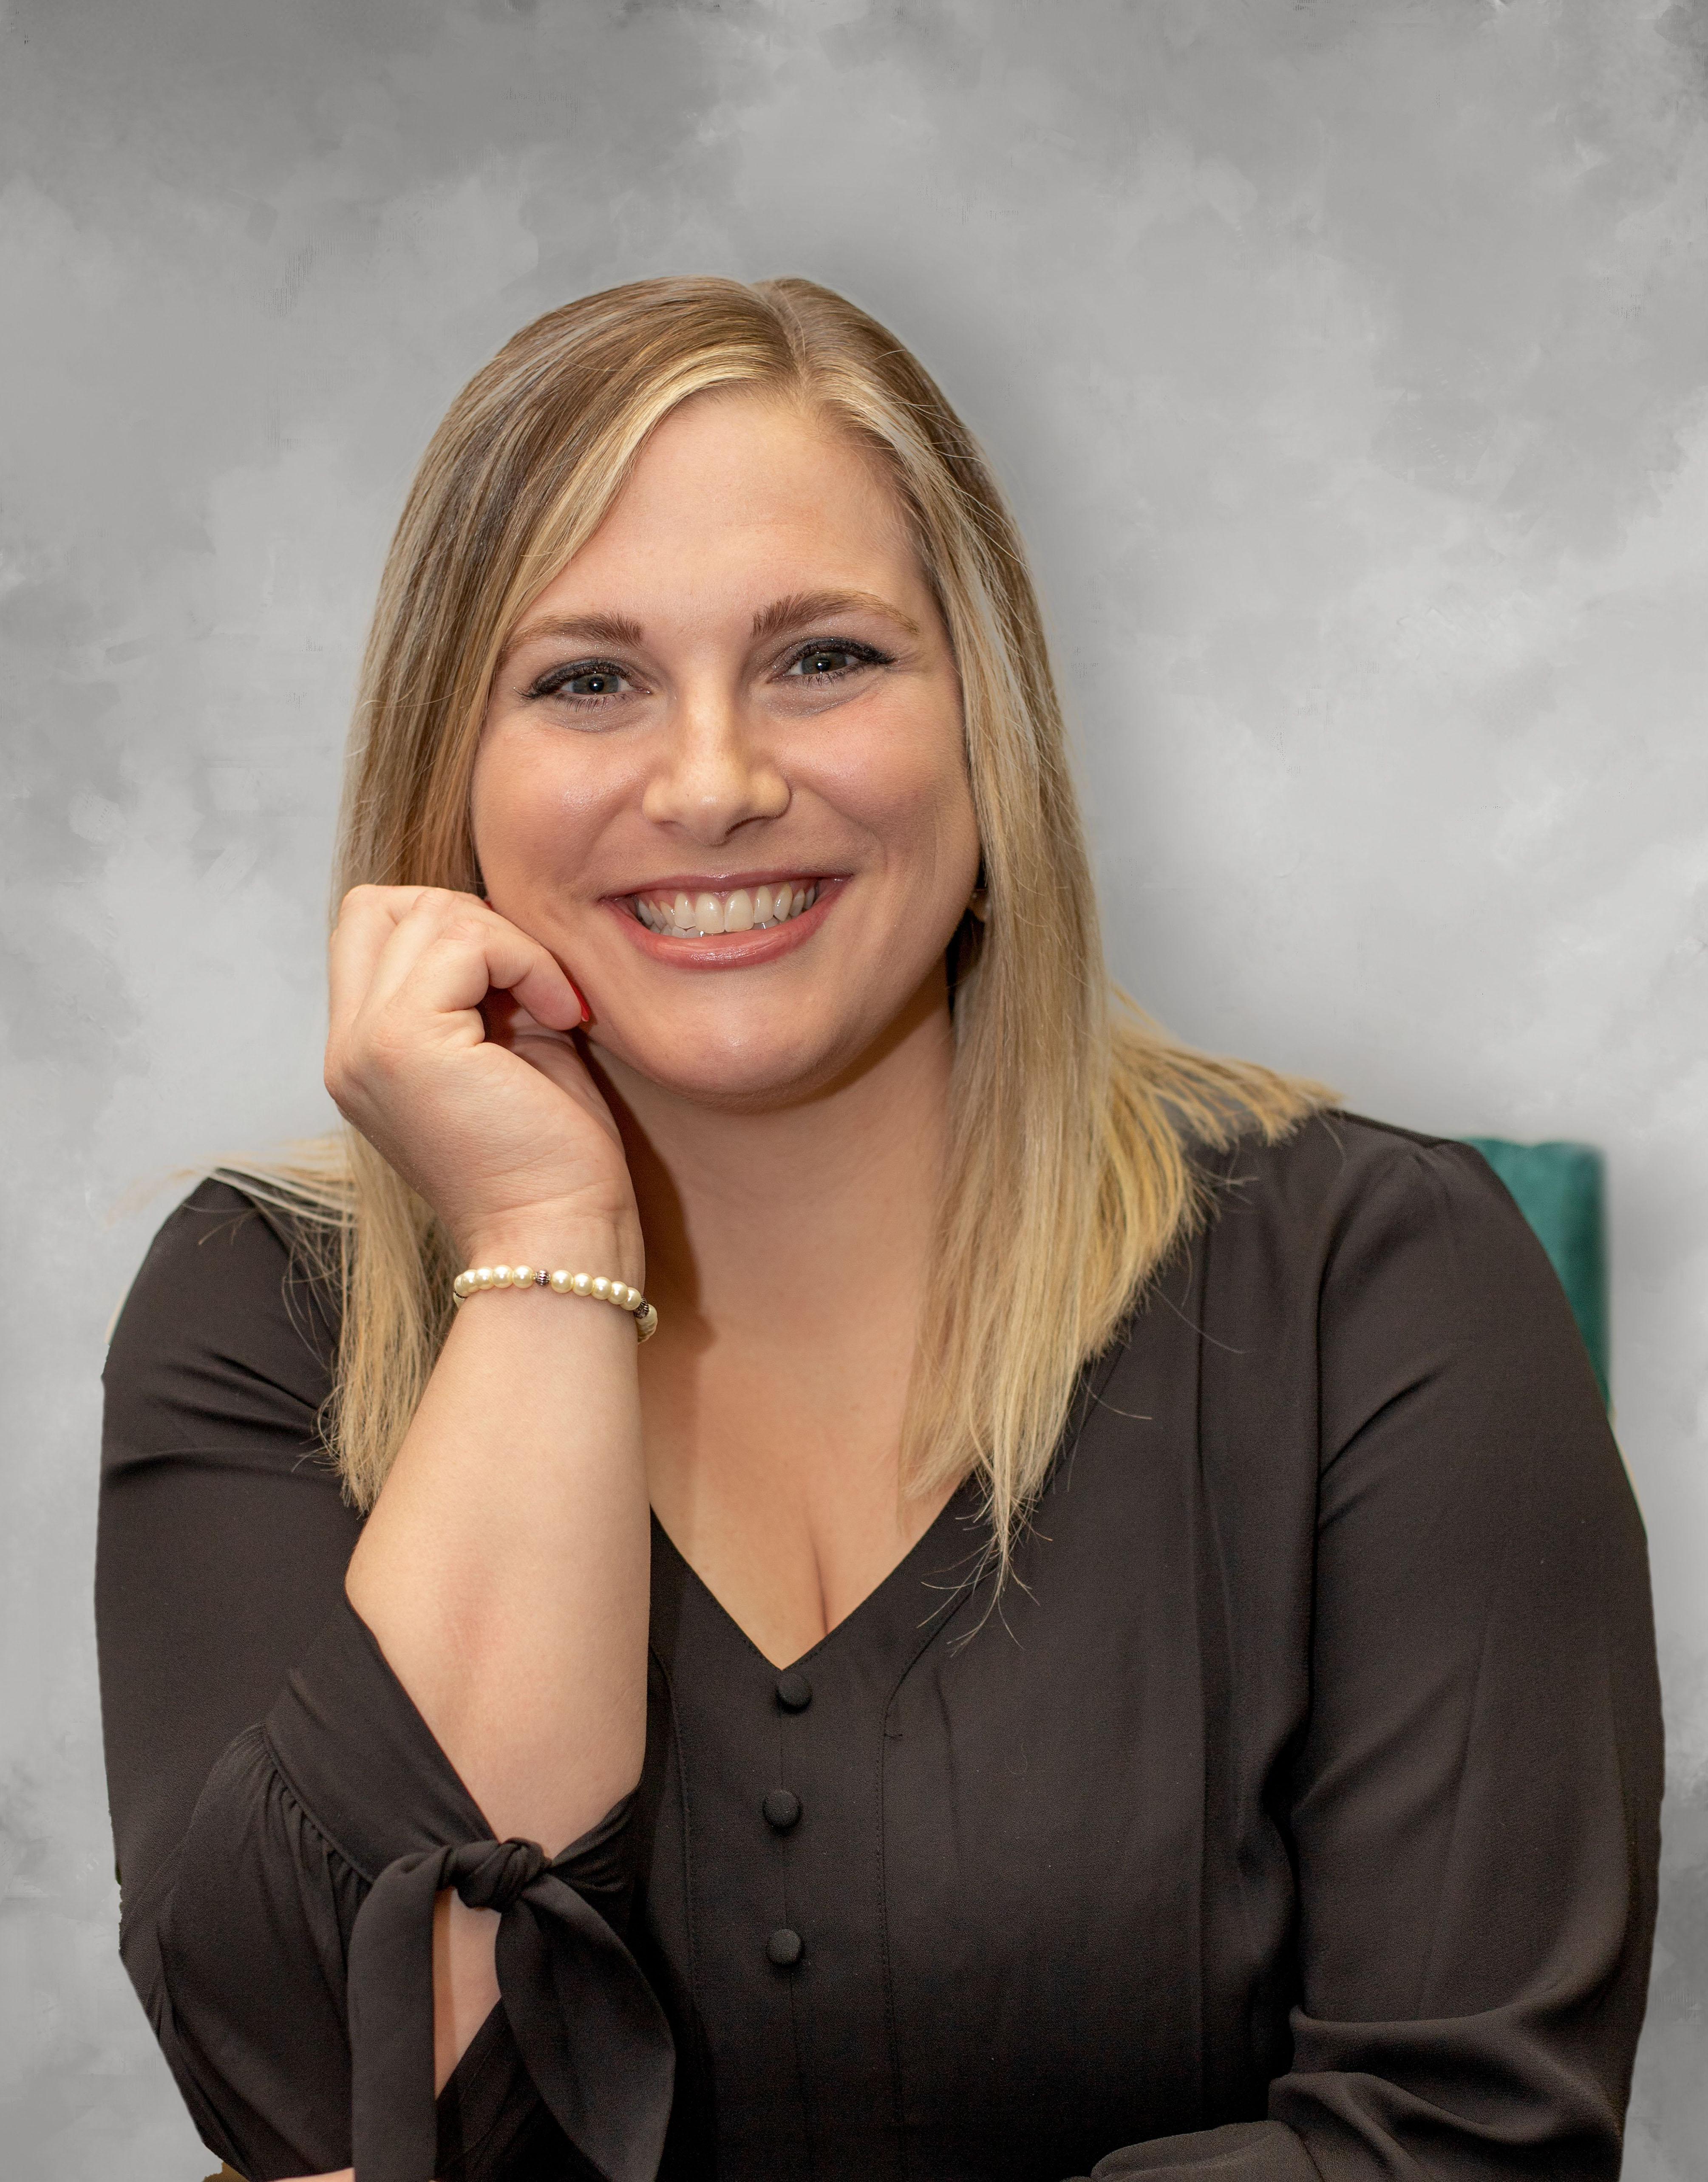 Meredith Freeman